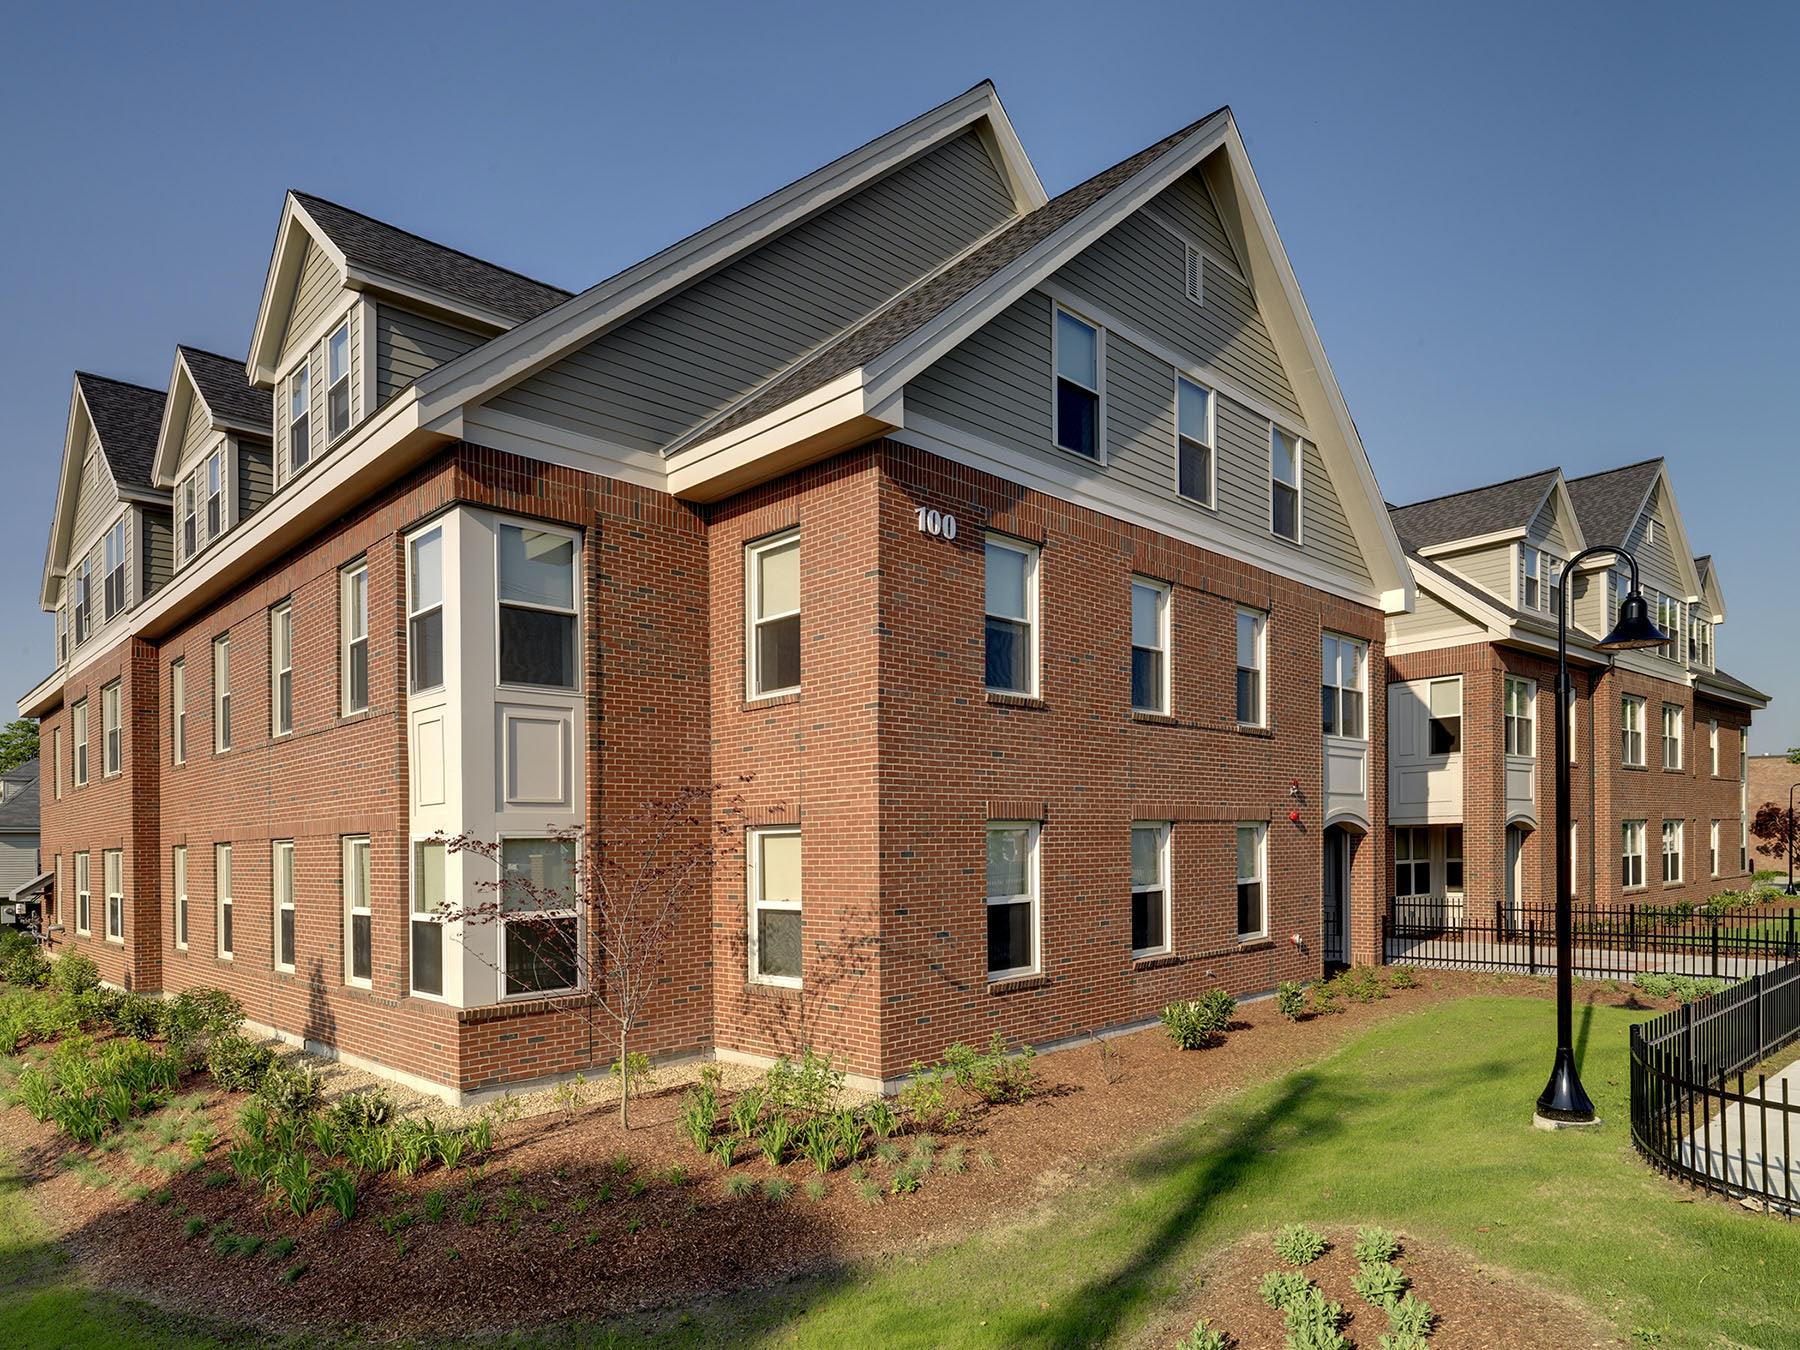 Dean College – Horne Residence Hall